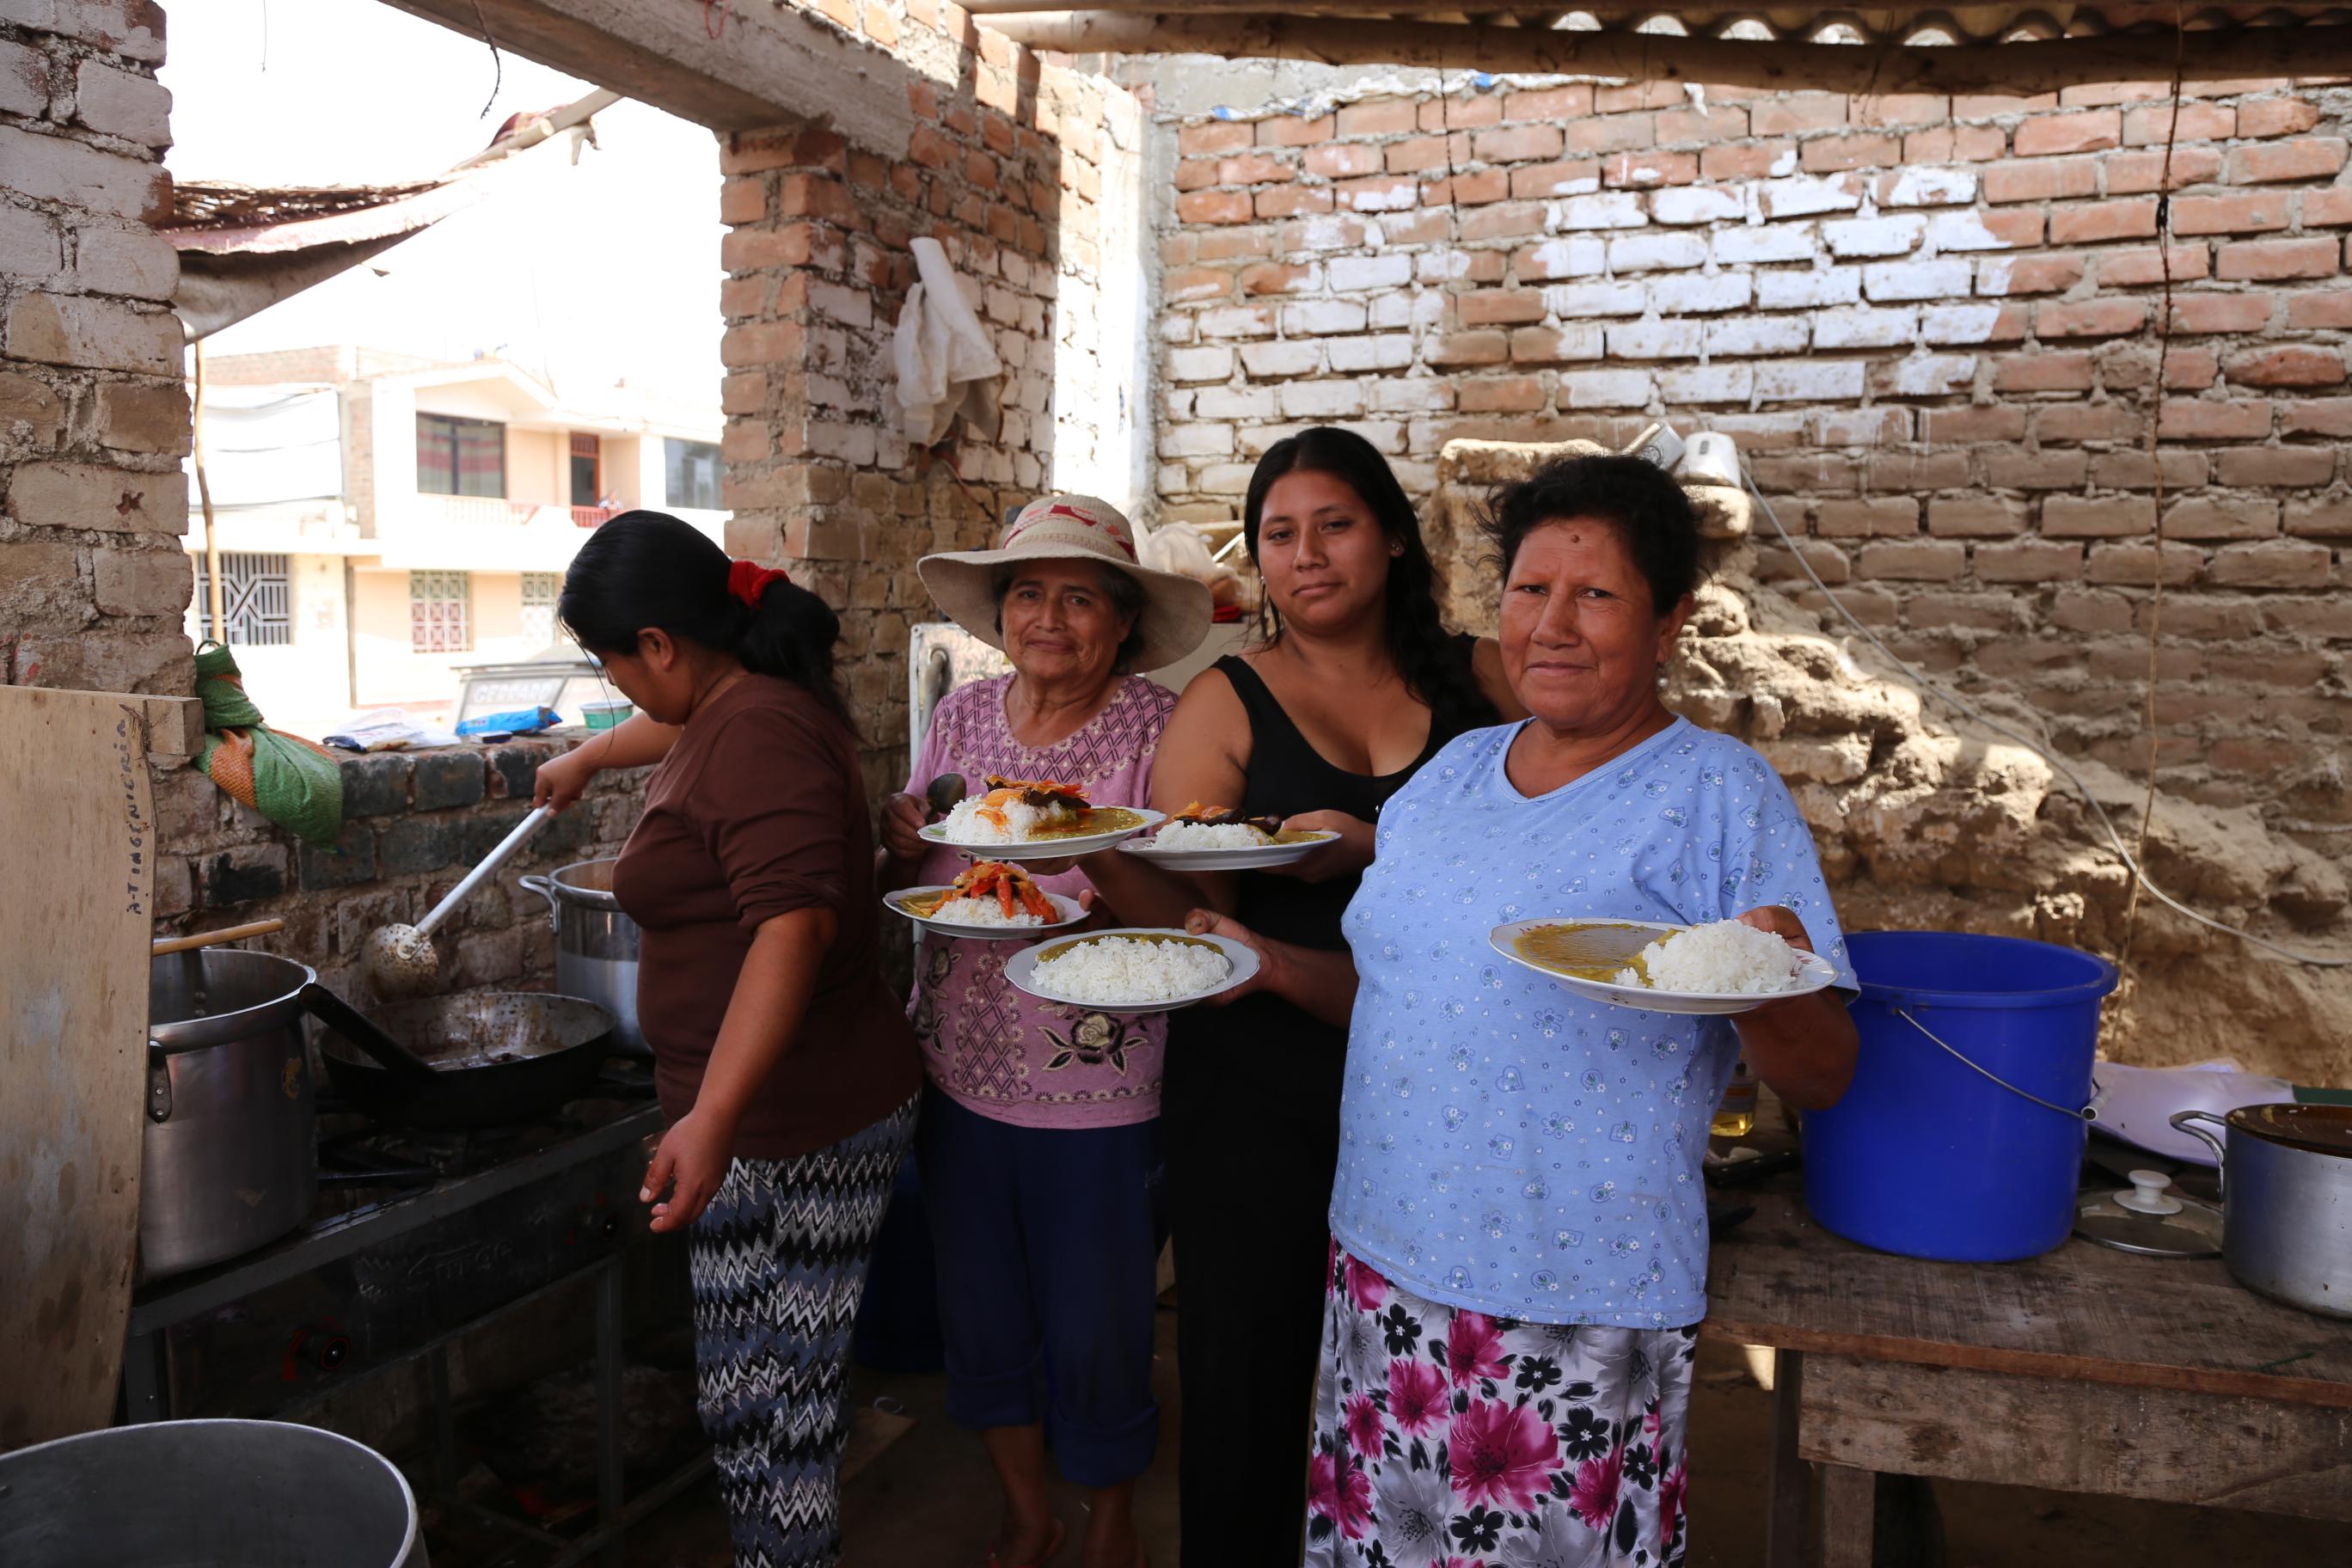 PERU: Yolanda Enriquez's story